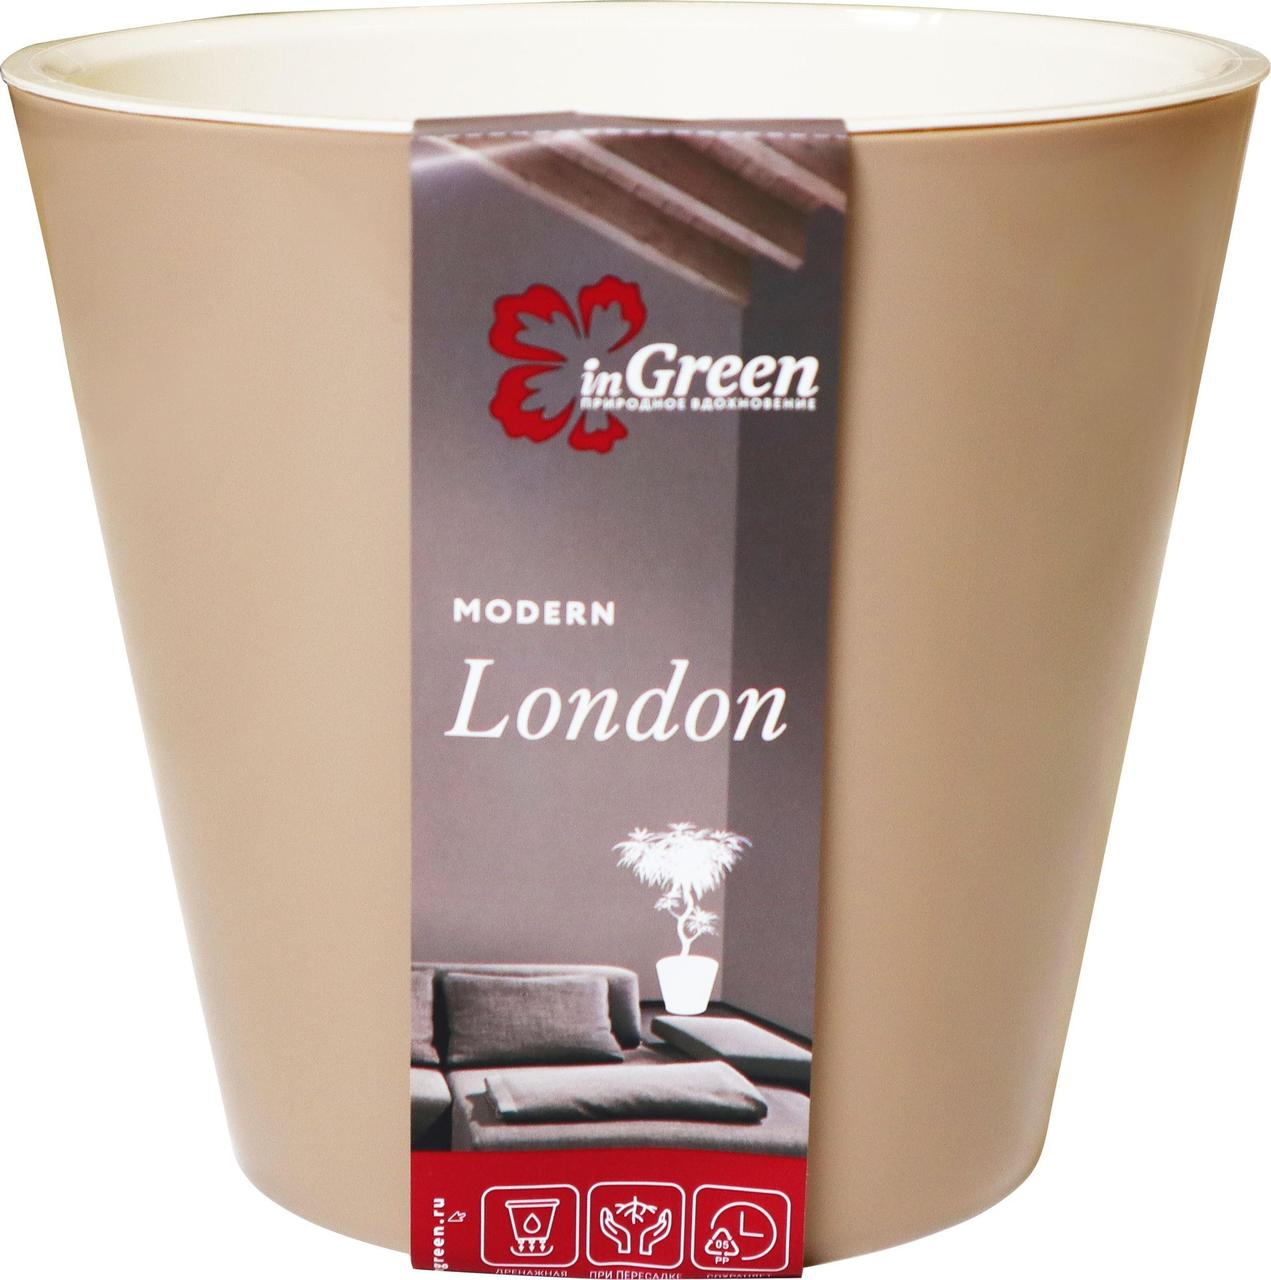 Горшок для цветов London 330 мм, 16л на колесиках молочный шоколад